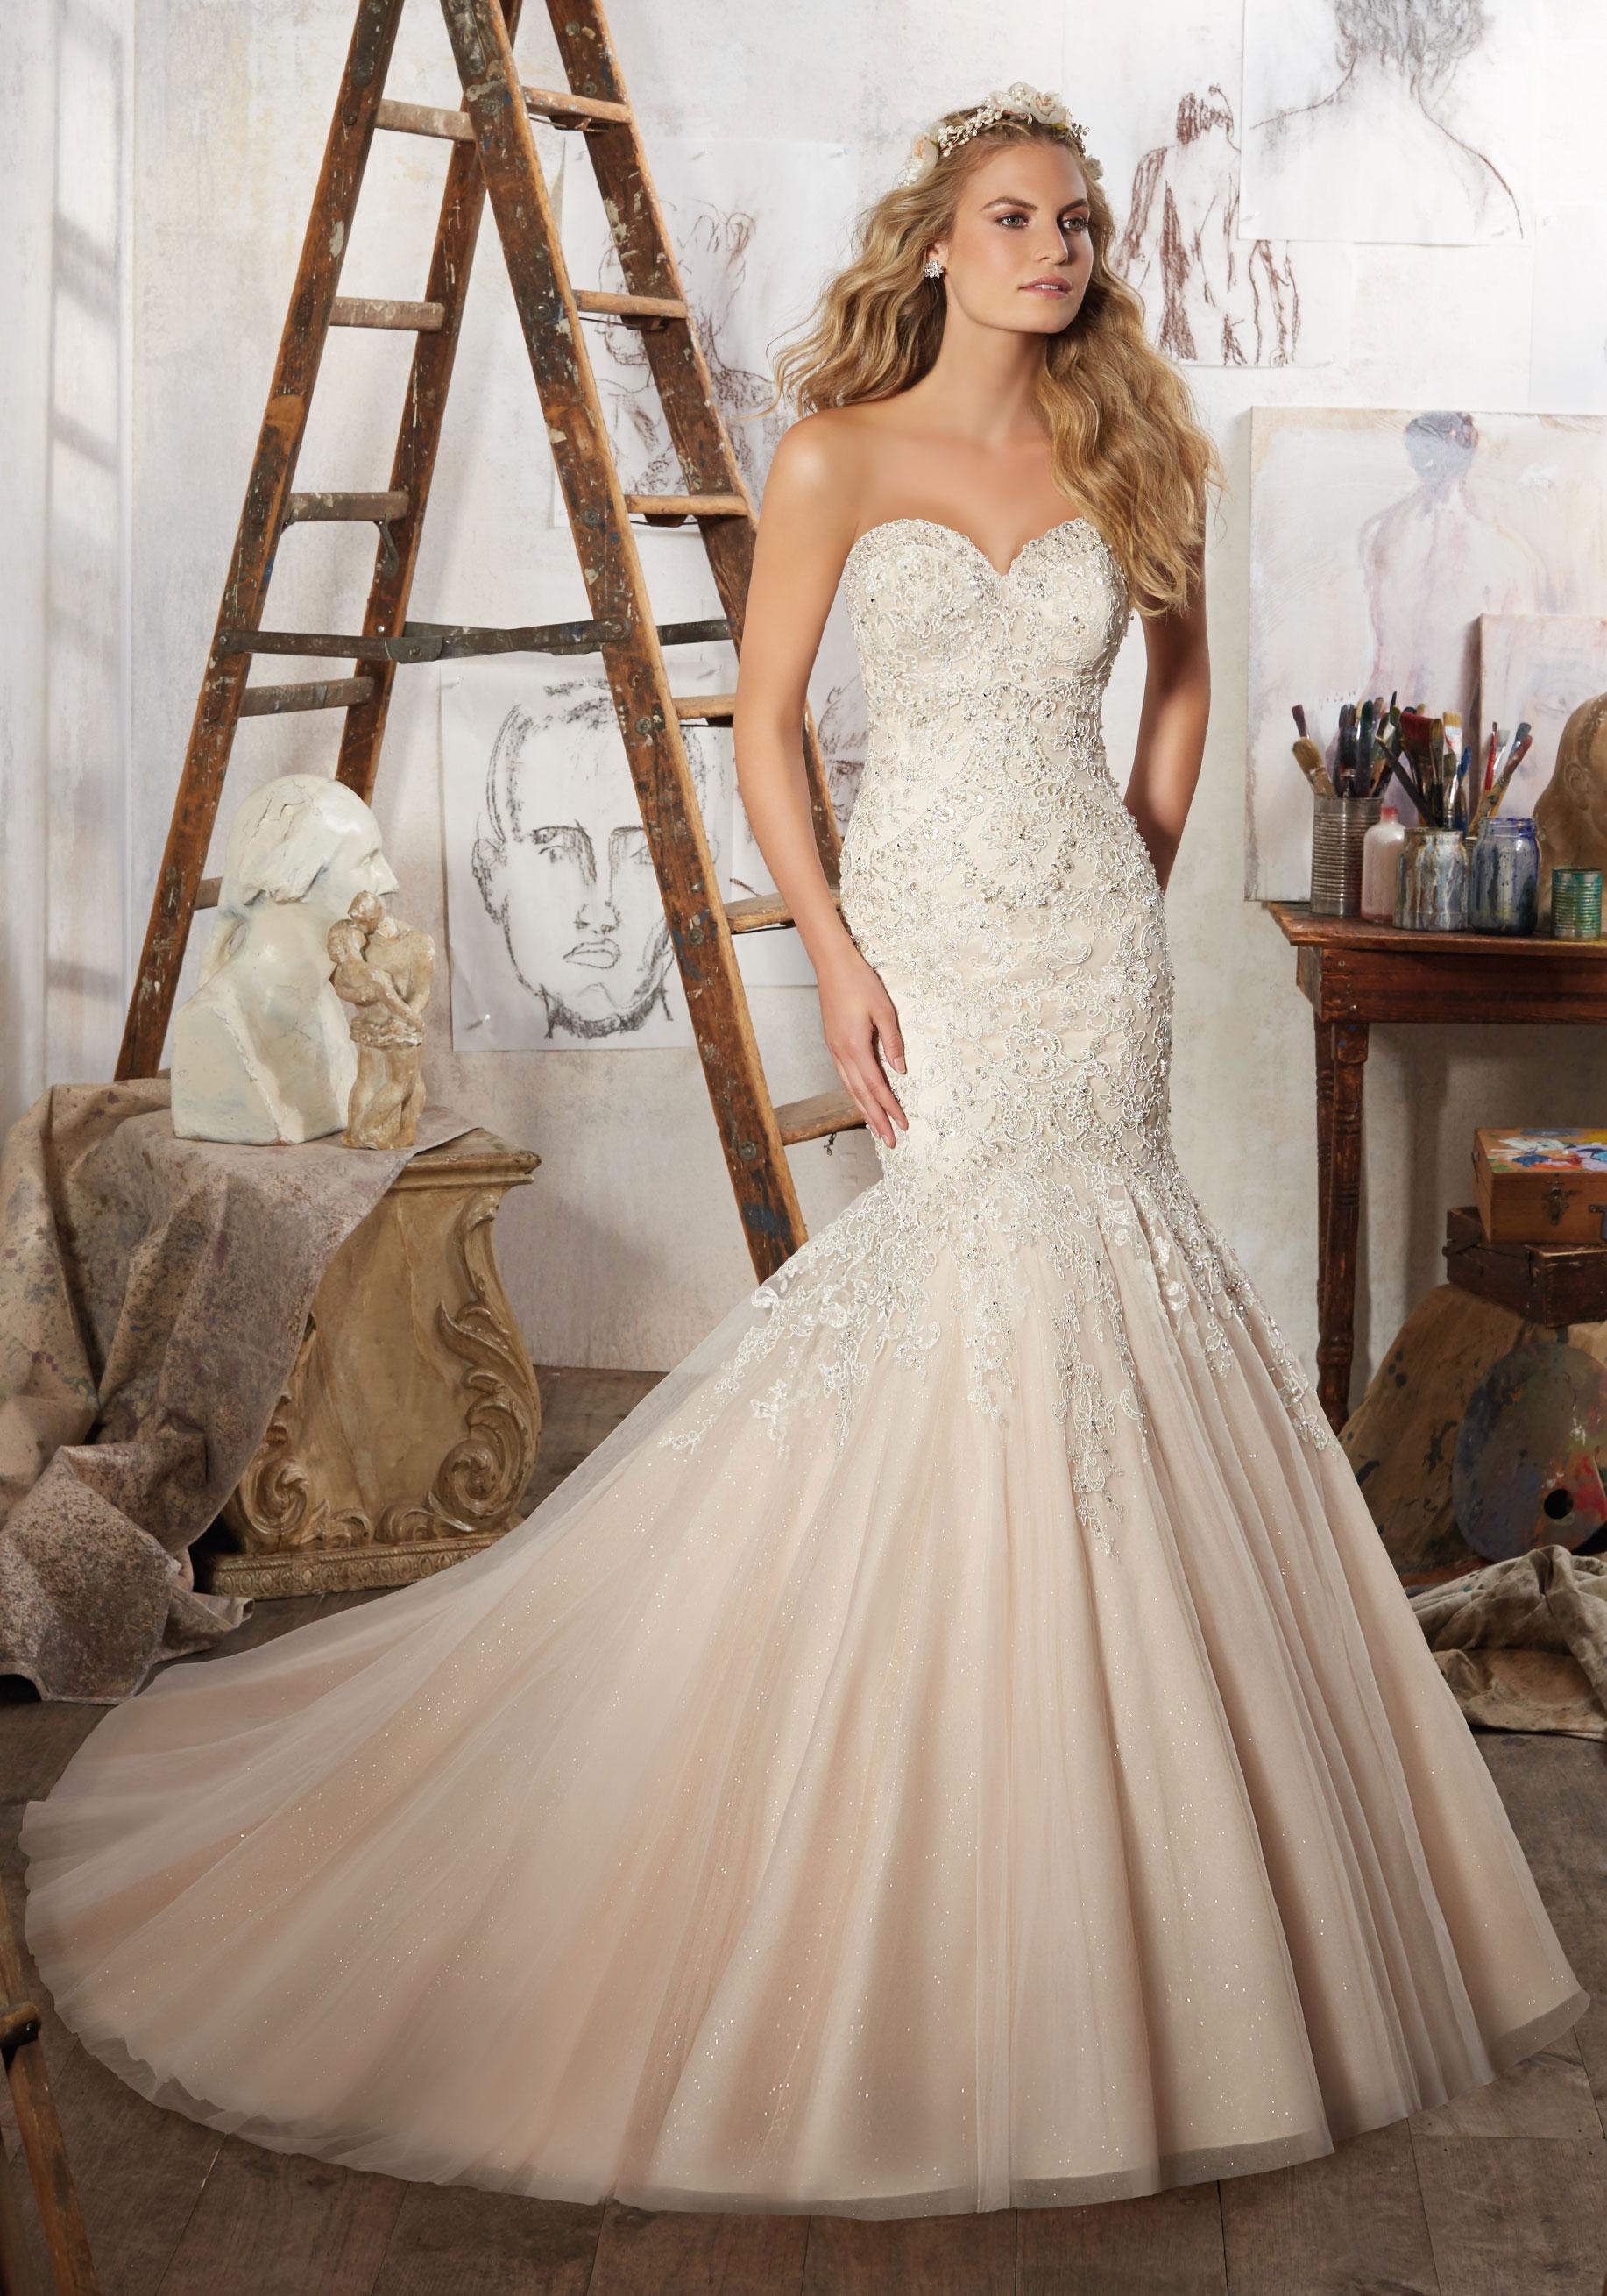 Wedding Gowns Near Me Vosoicom